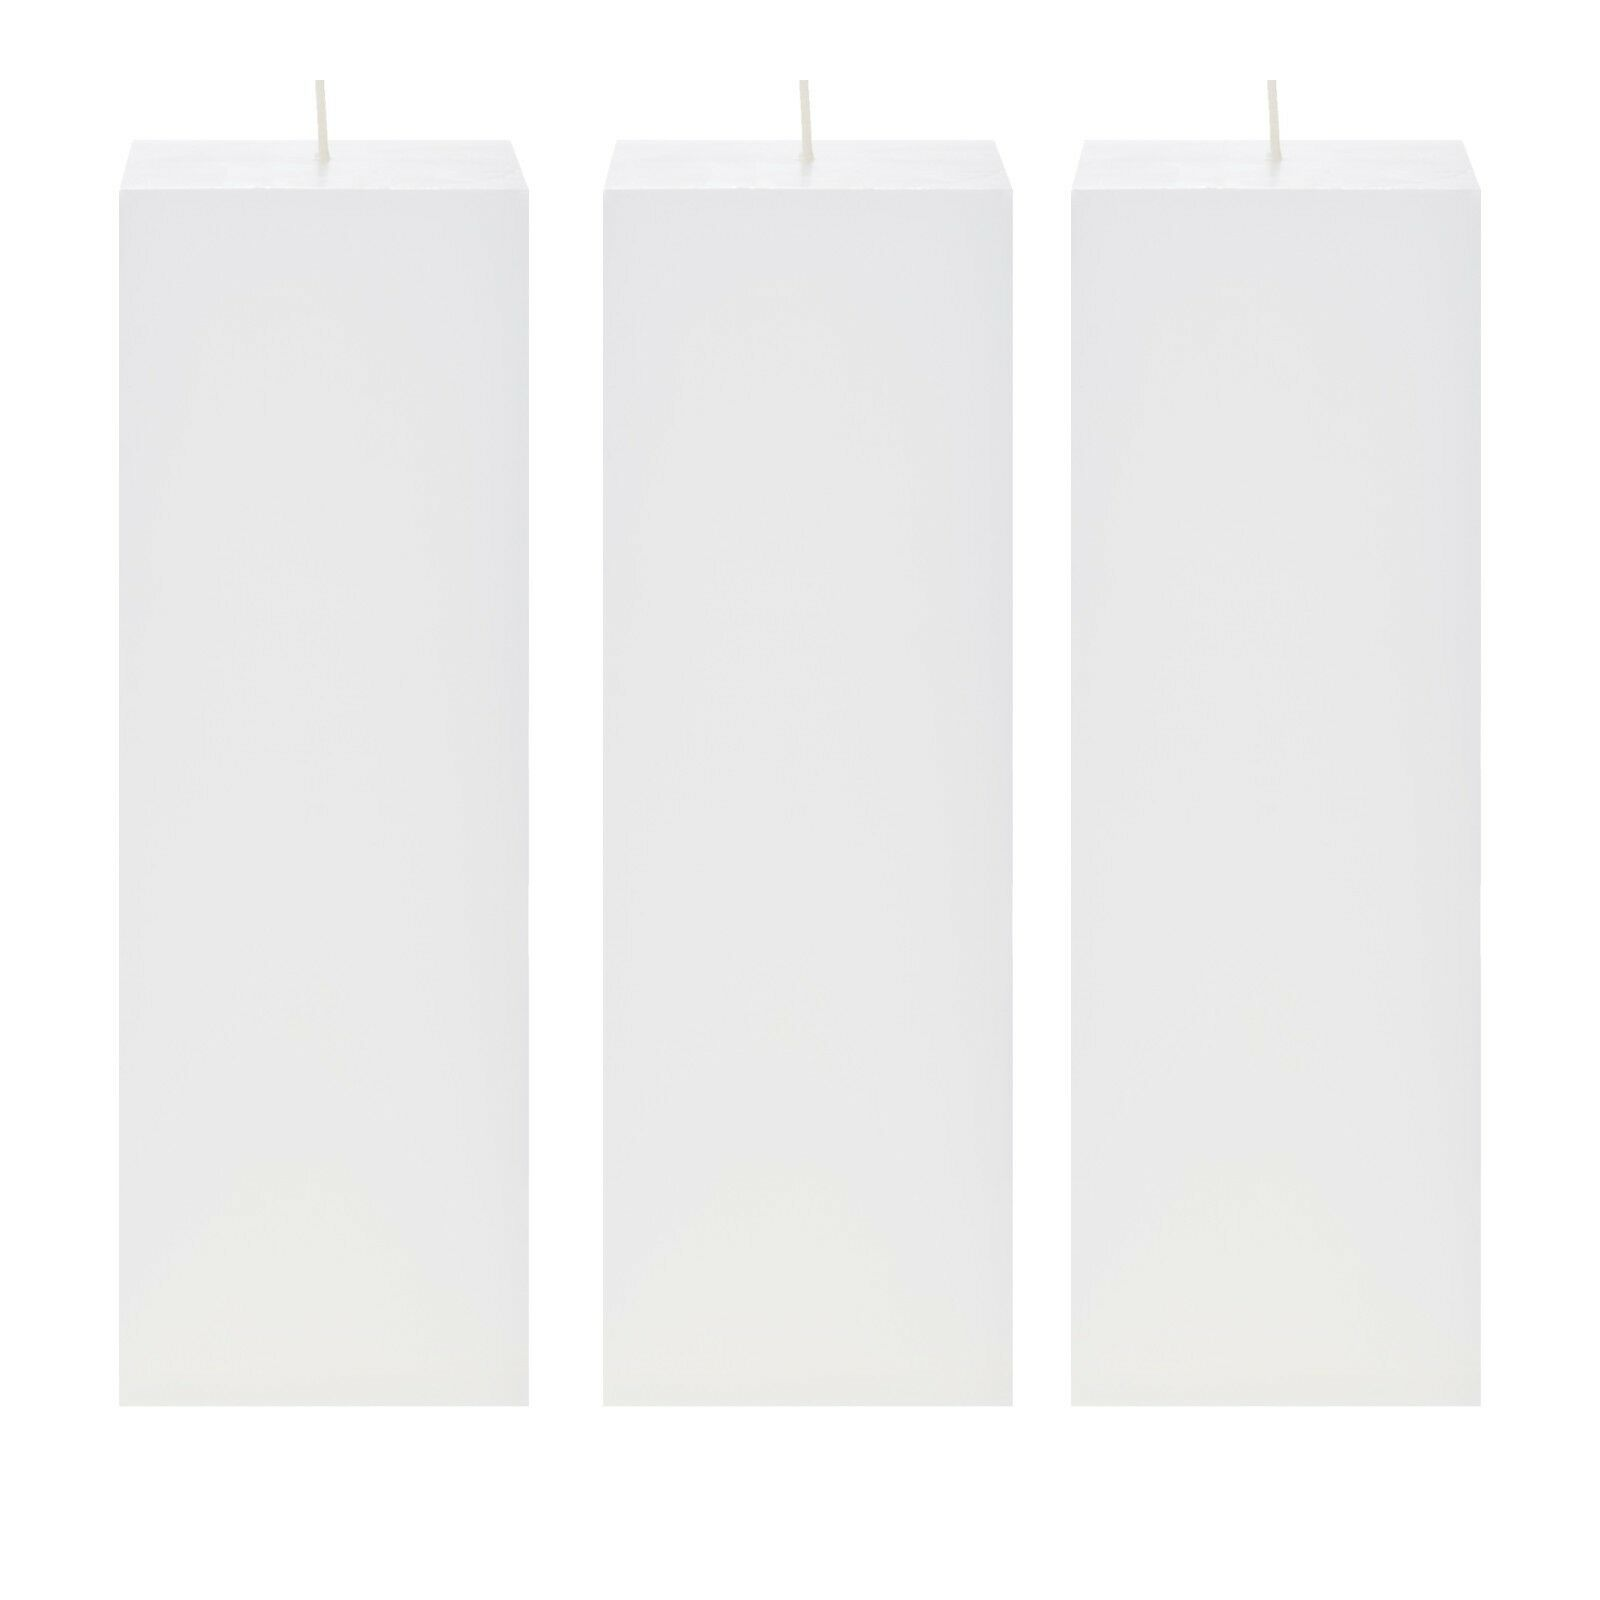 Mega Candles 3 pcs Unscented White Square Pillar Candle | Ha